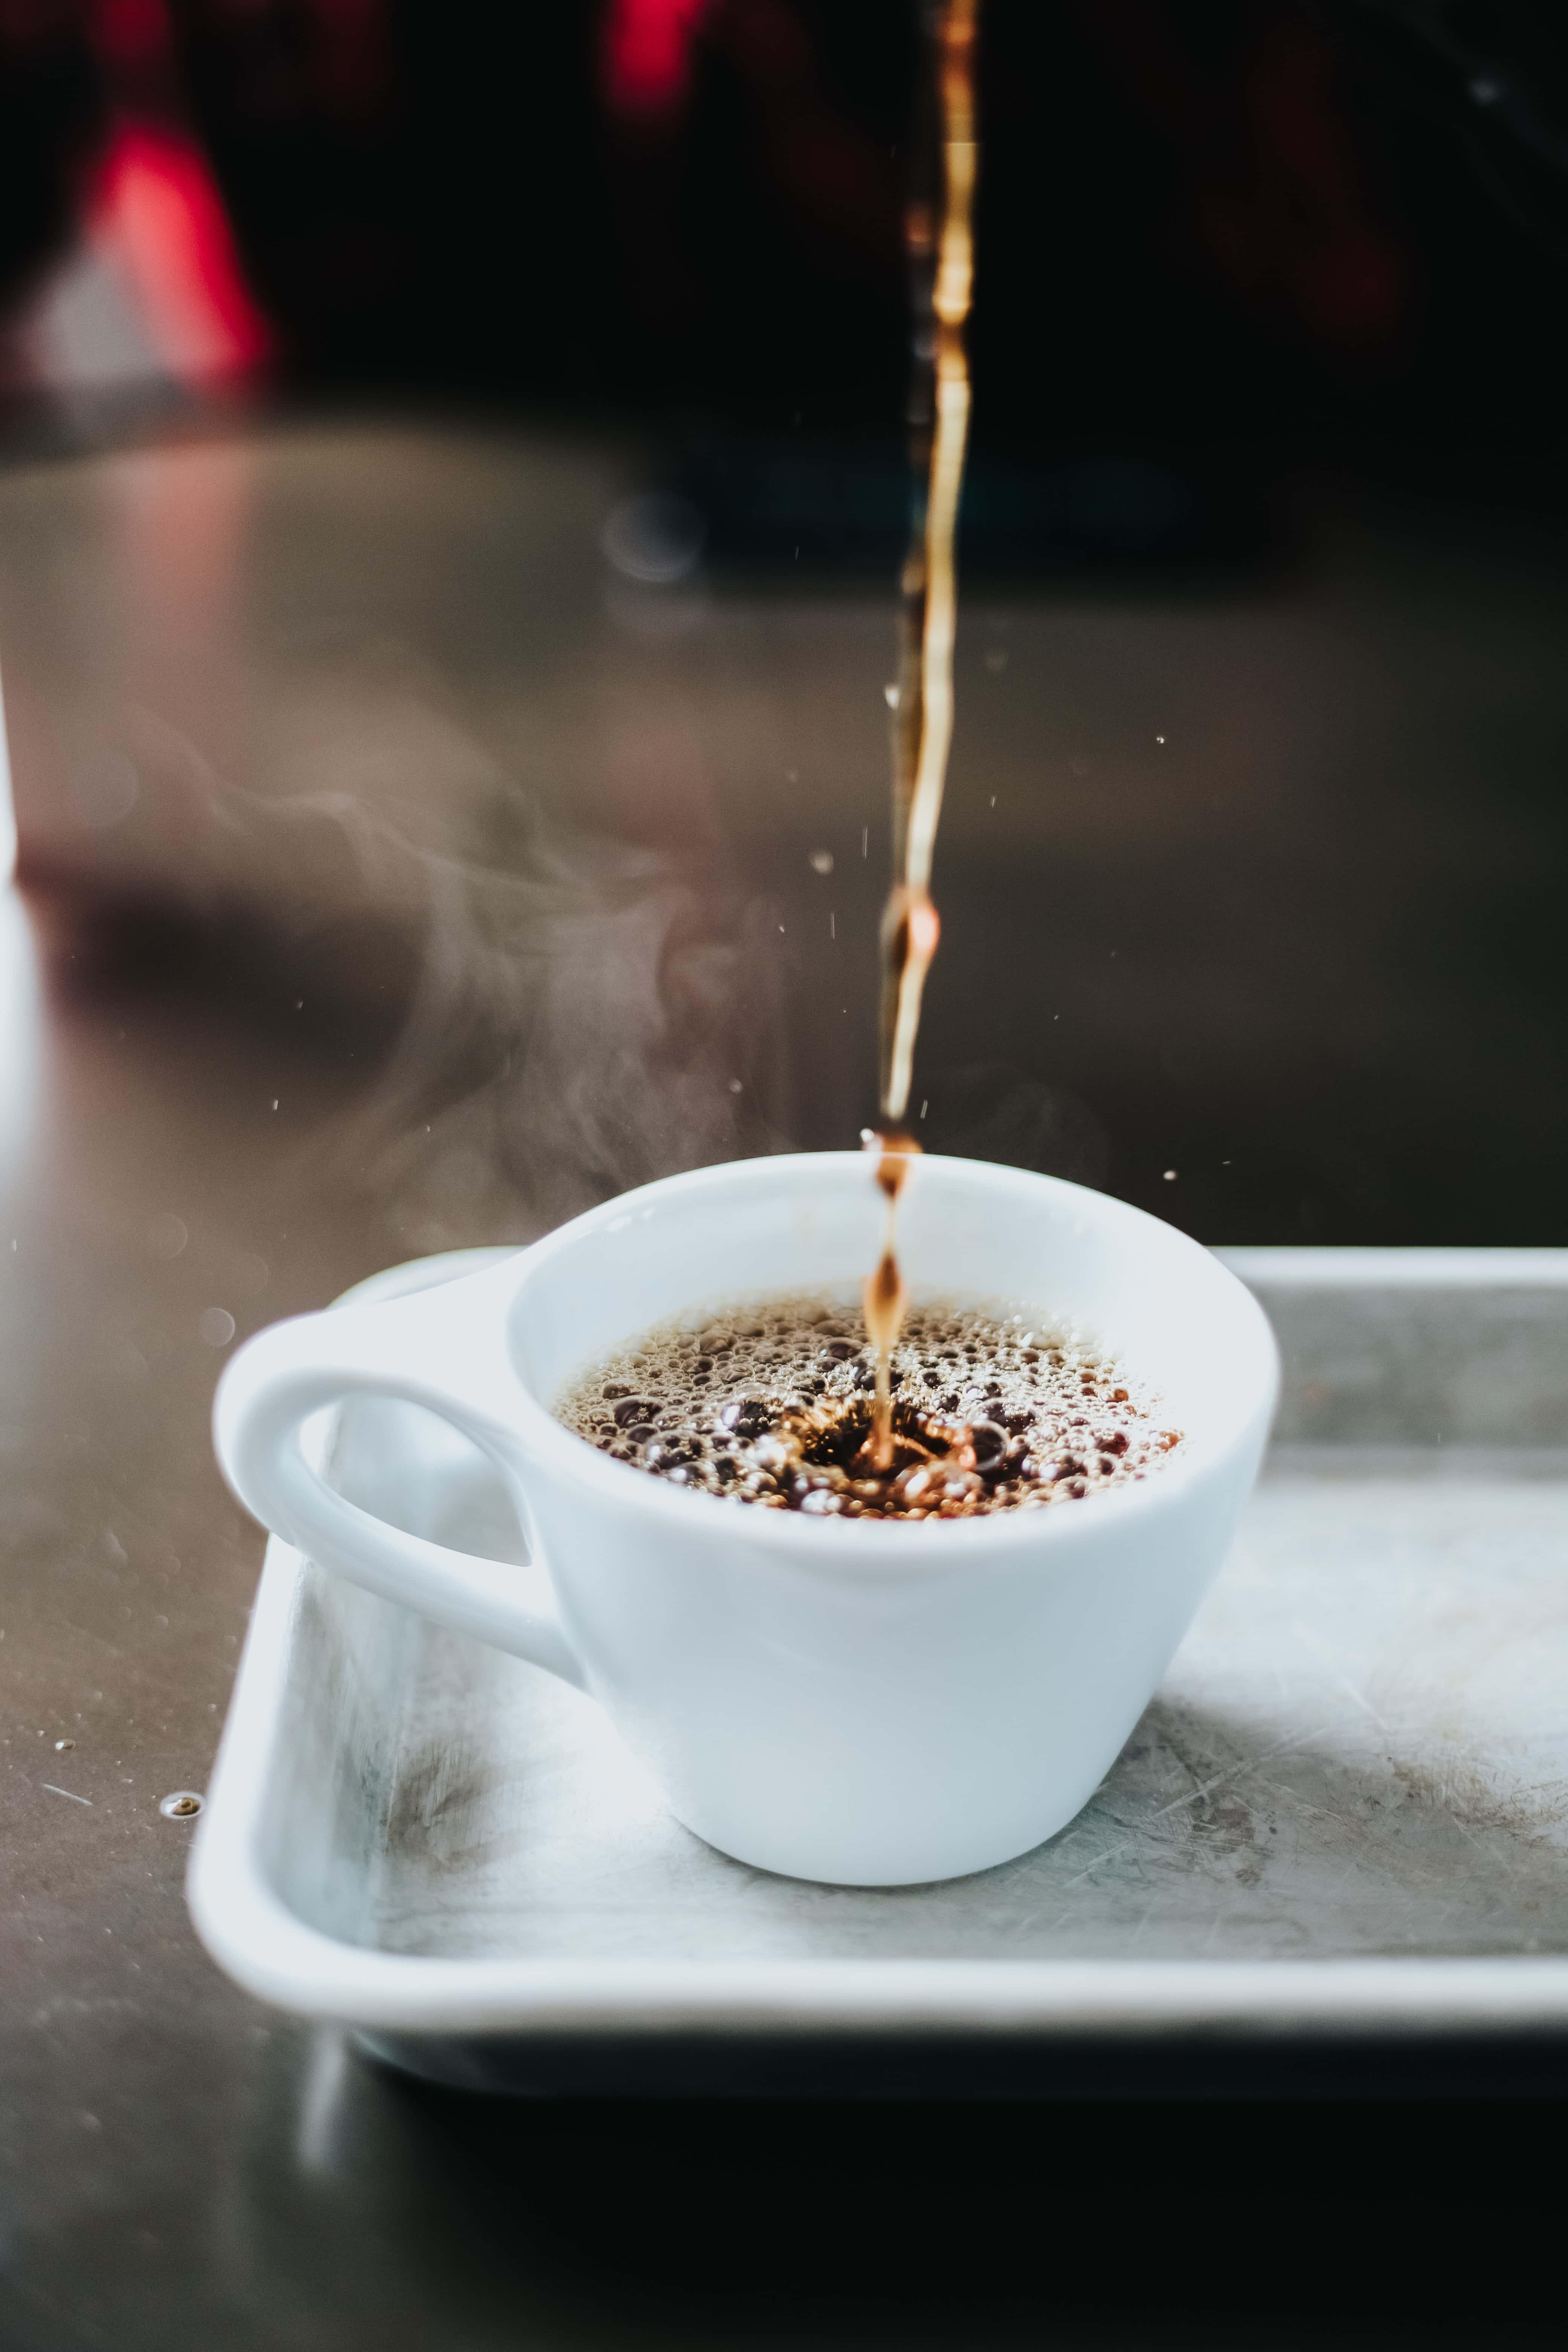 Coffee poured into a mug